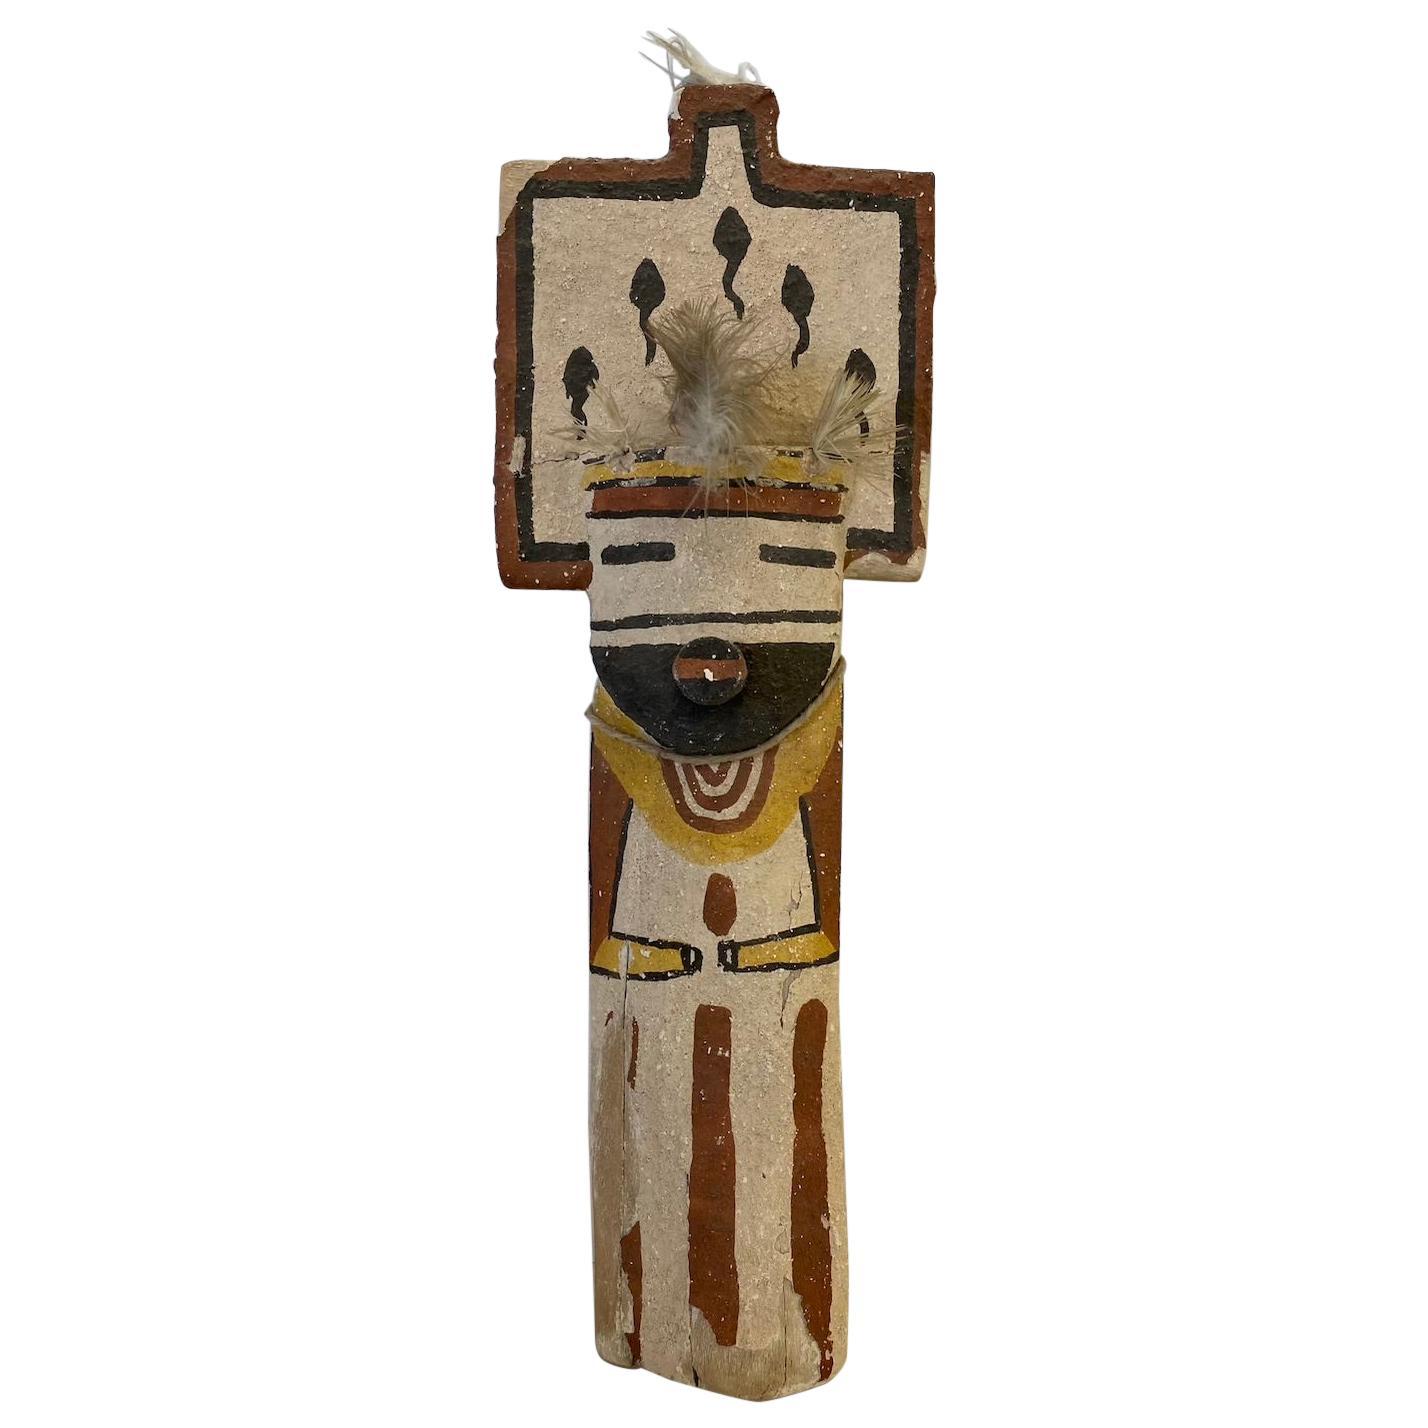 Mid-20th Century Child's Painted Wood Kachina Doll